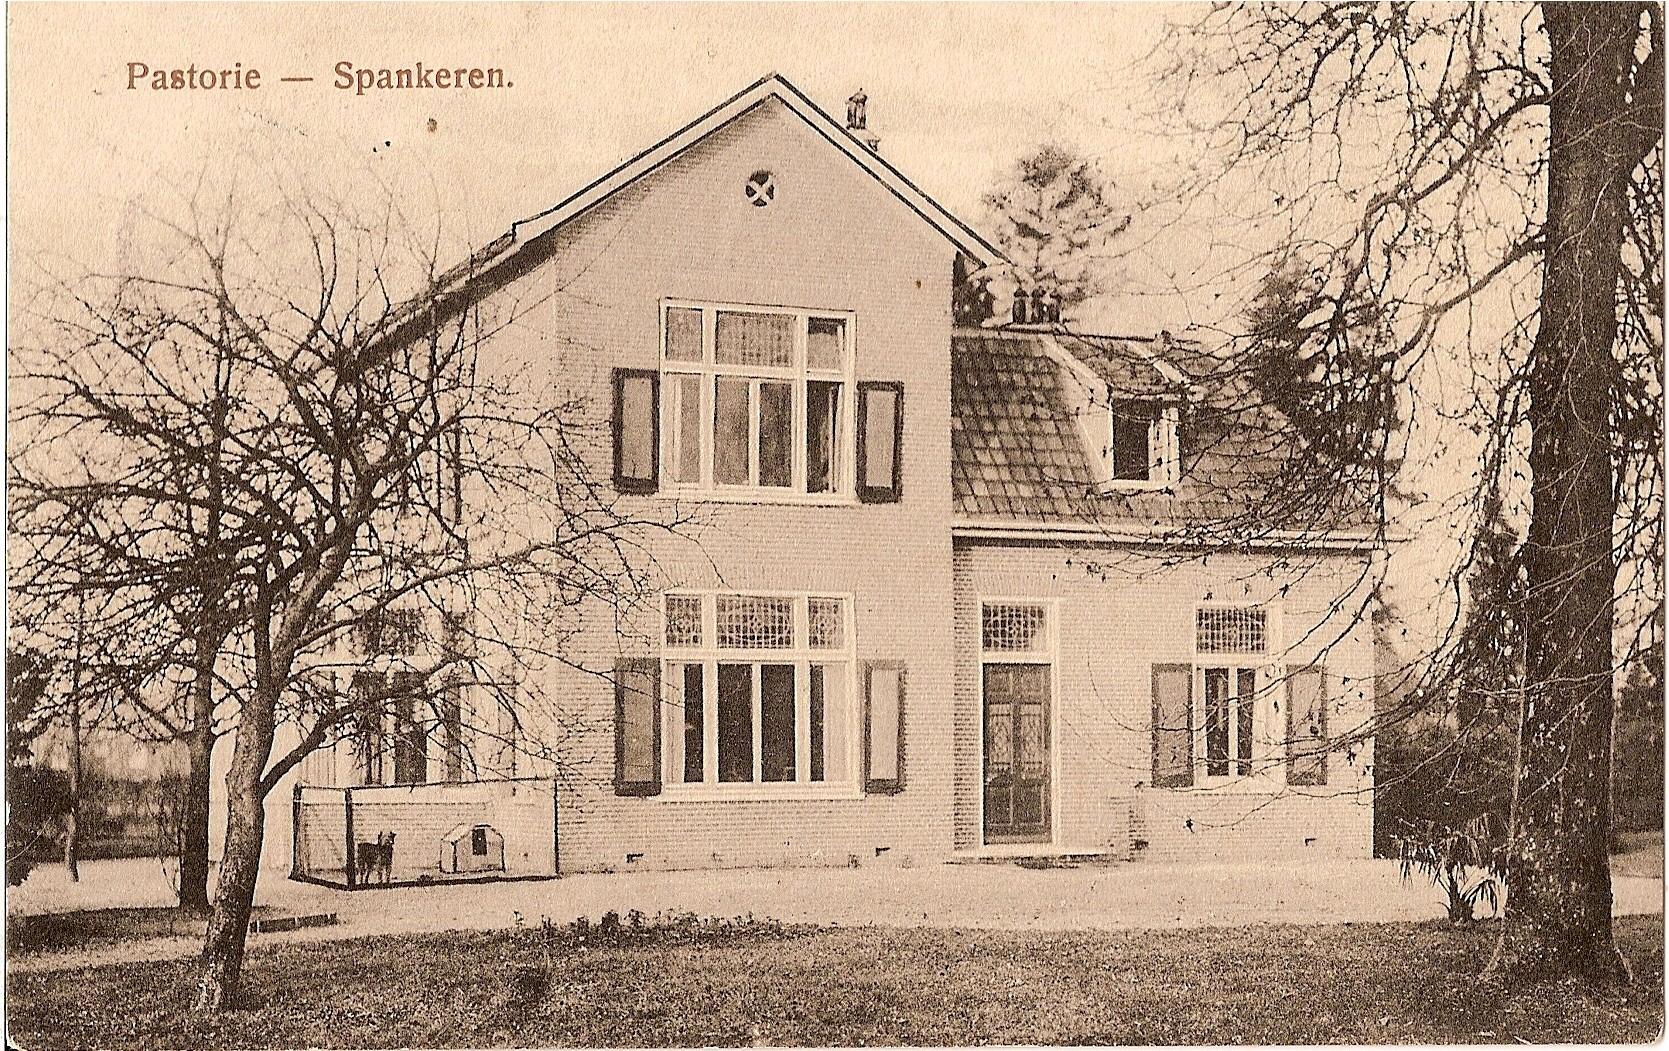 Pastorie 1912-1973